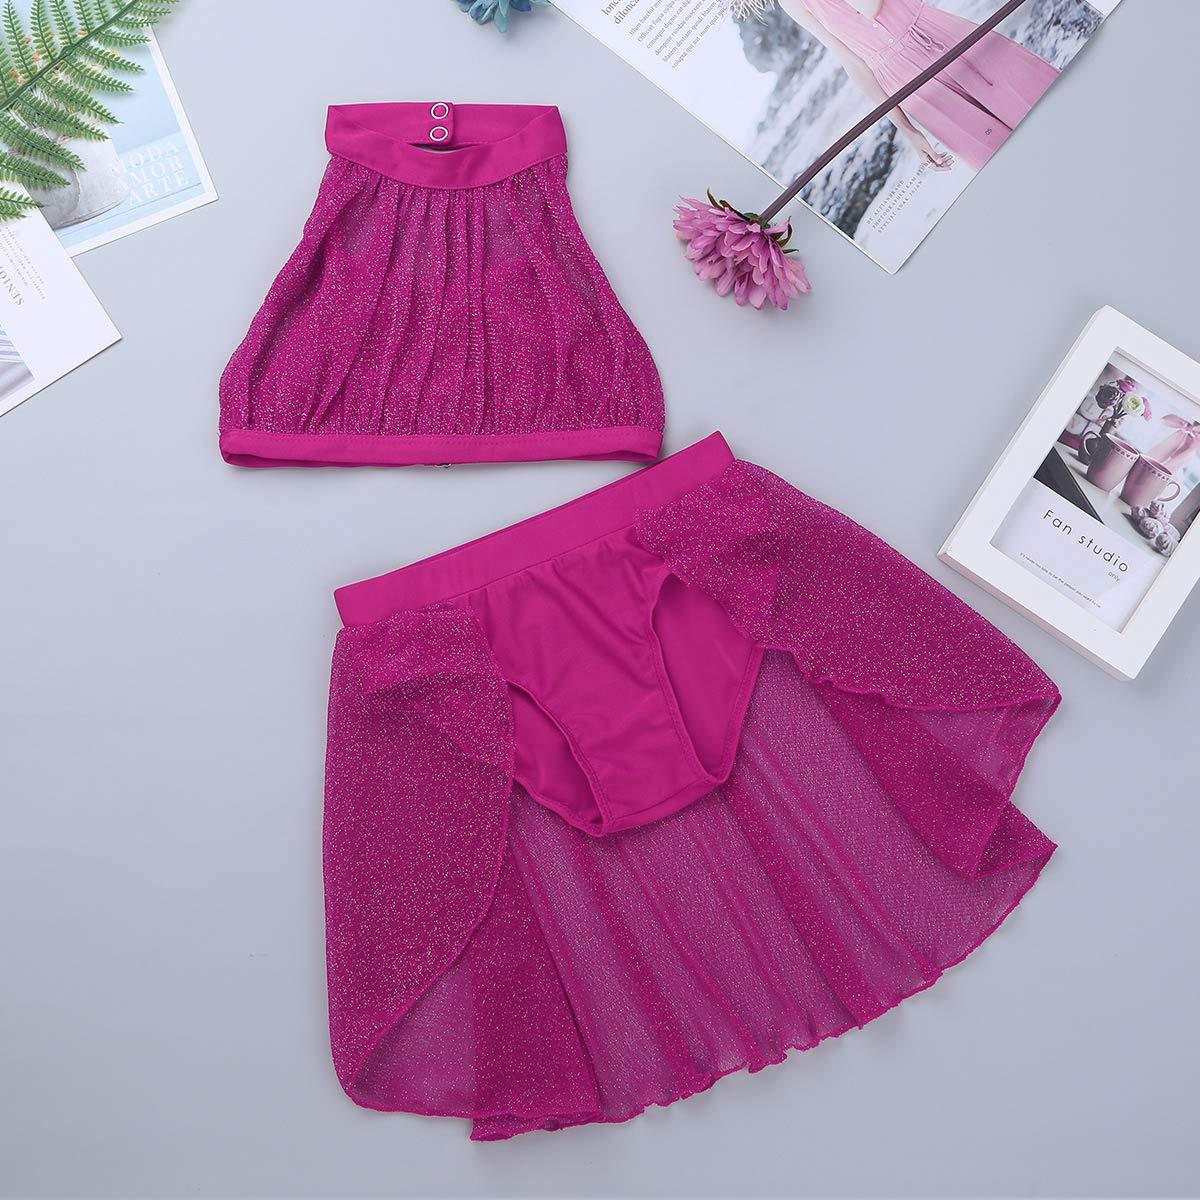 JEATHA Kids Girls Sleeveless Glittery Lyrical Modern Dance Latin Jazz Costumes Crop Top with Tulle Dress Bottoms